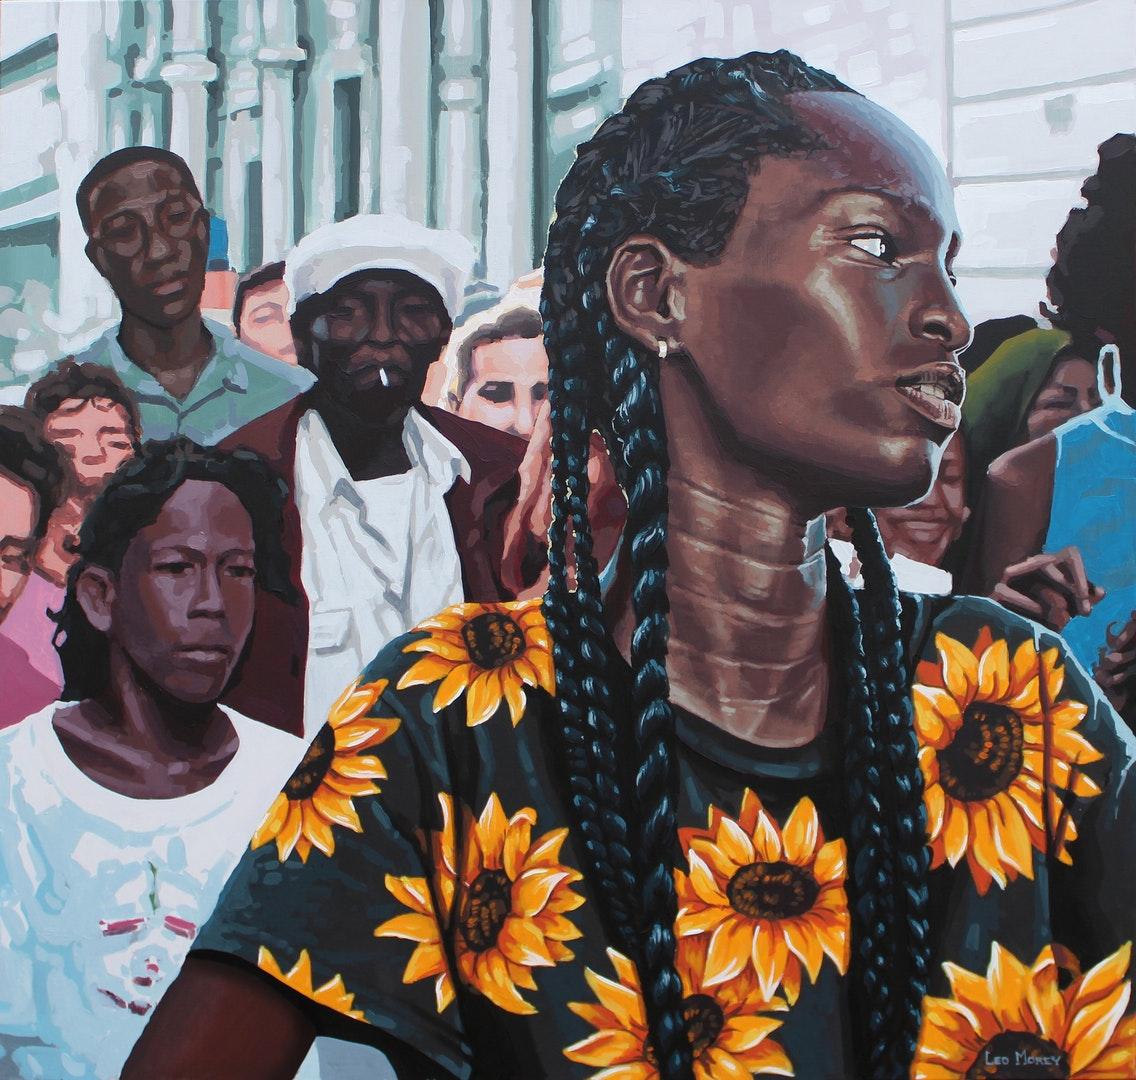 'Future', Leo Morey, Acrylic on canvas, 91 x 91 cm